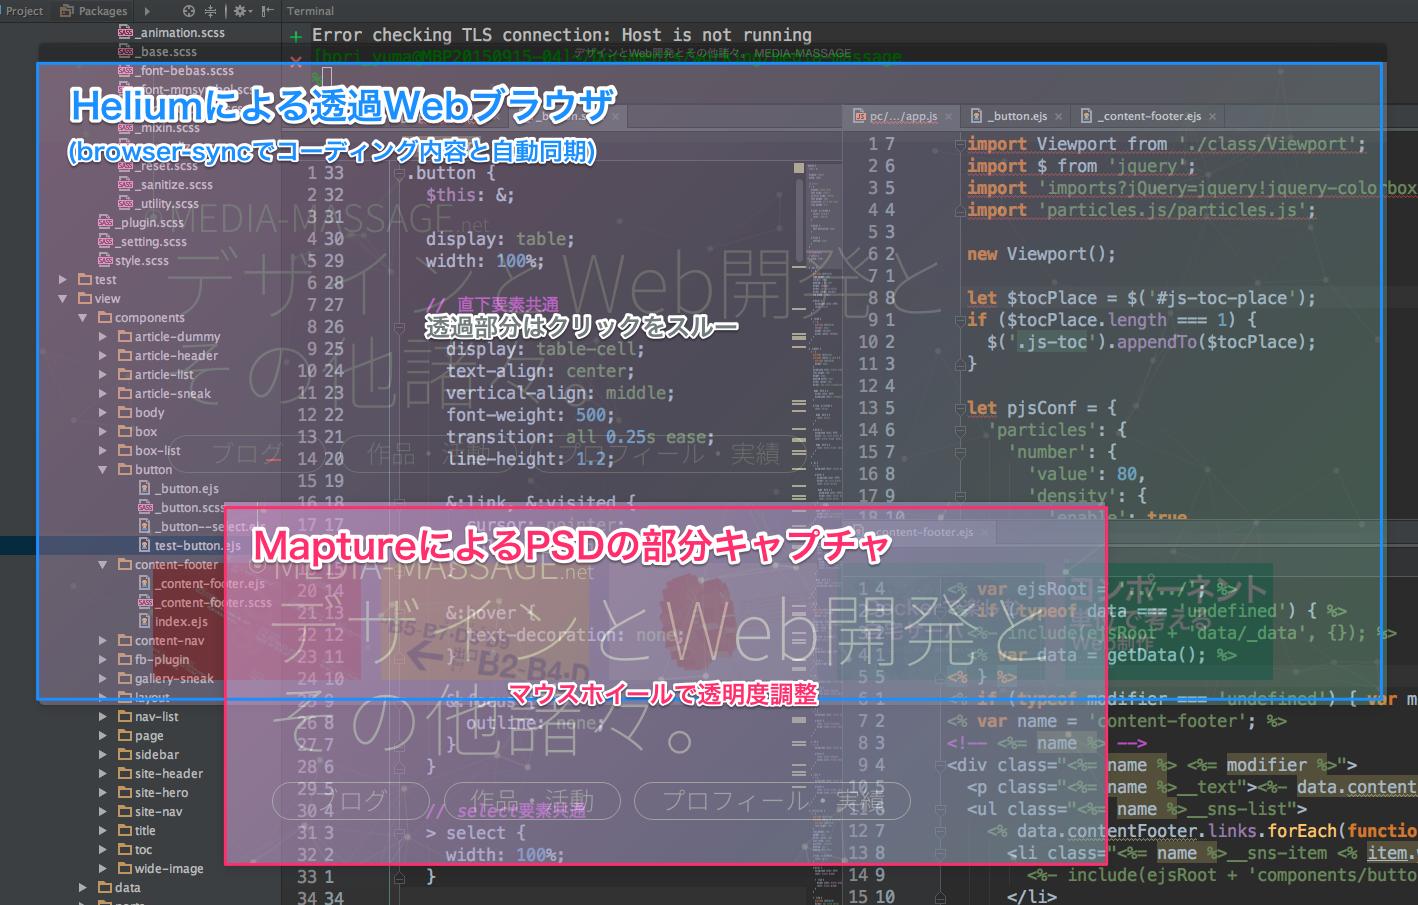 MaptureとHeliumによる開発の様子をキャプチャしたスクリーンショット画像